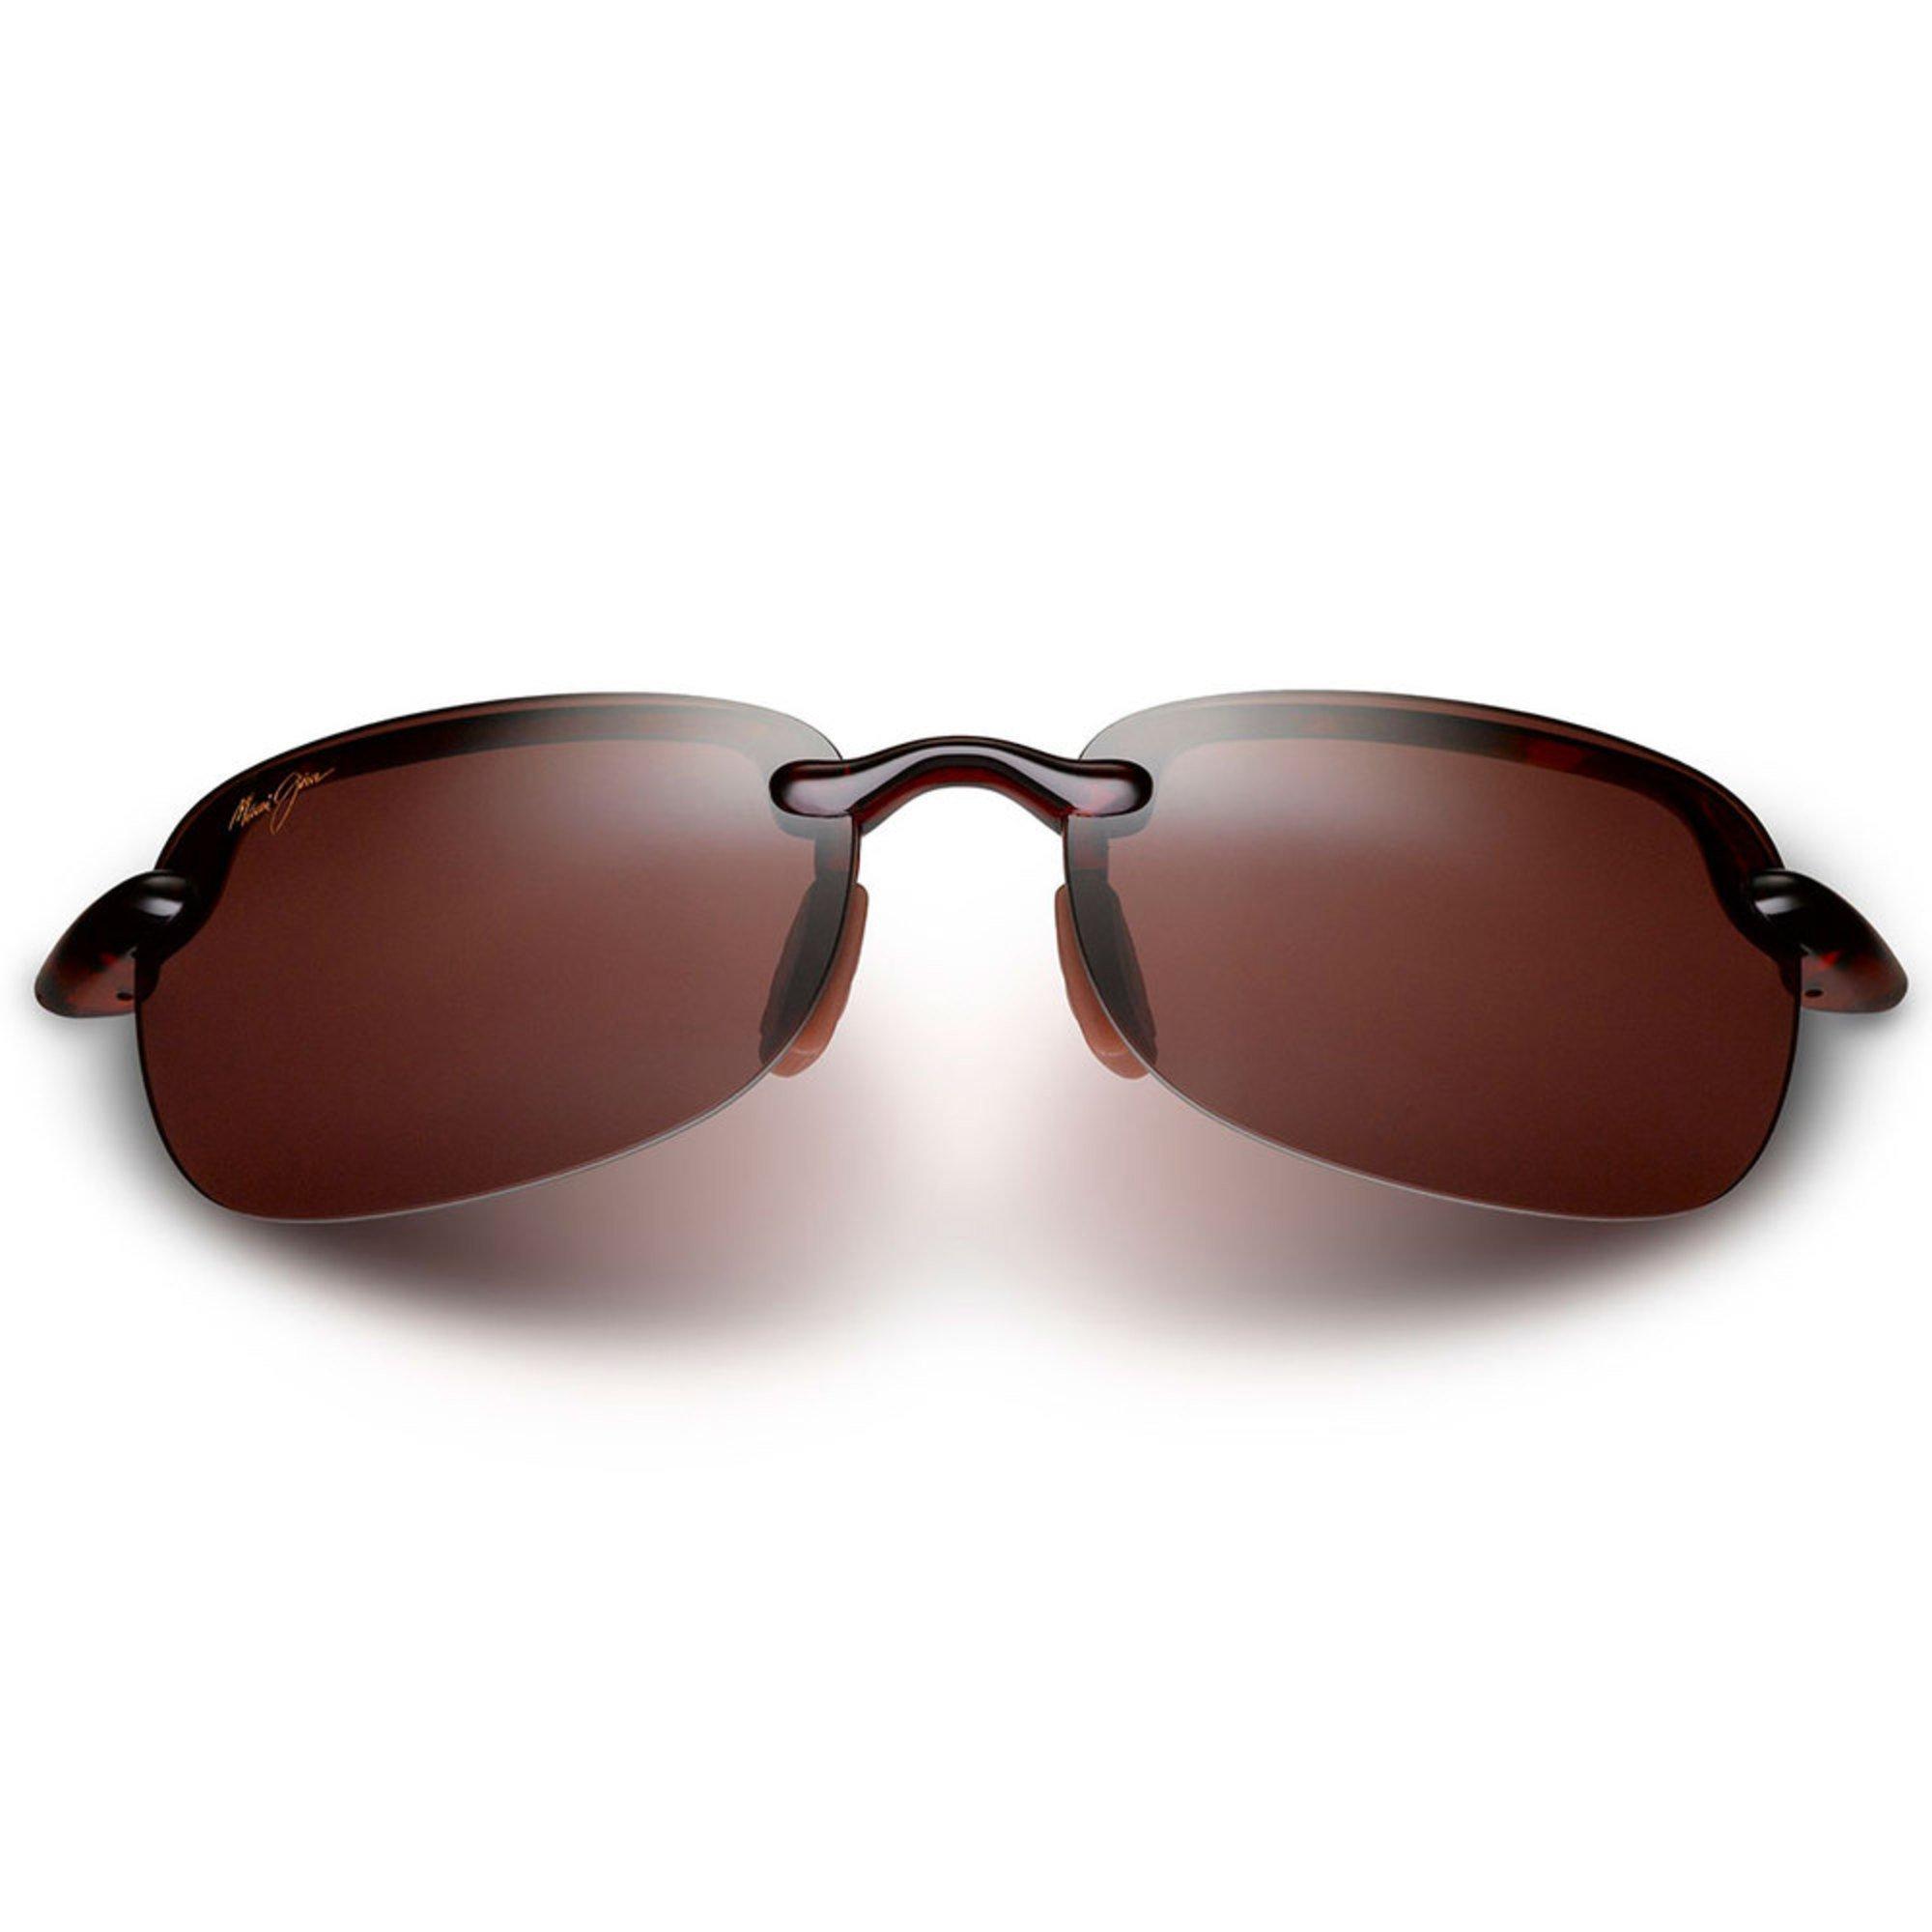 e6ff172655ae Maui Jim. Maui Jim Unisex Sandy Beach Tortoise Polarized Rimless Sunglasses